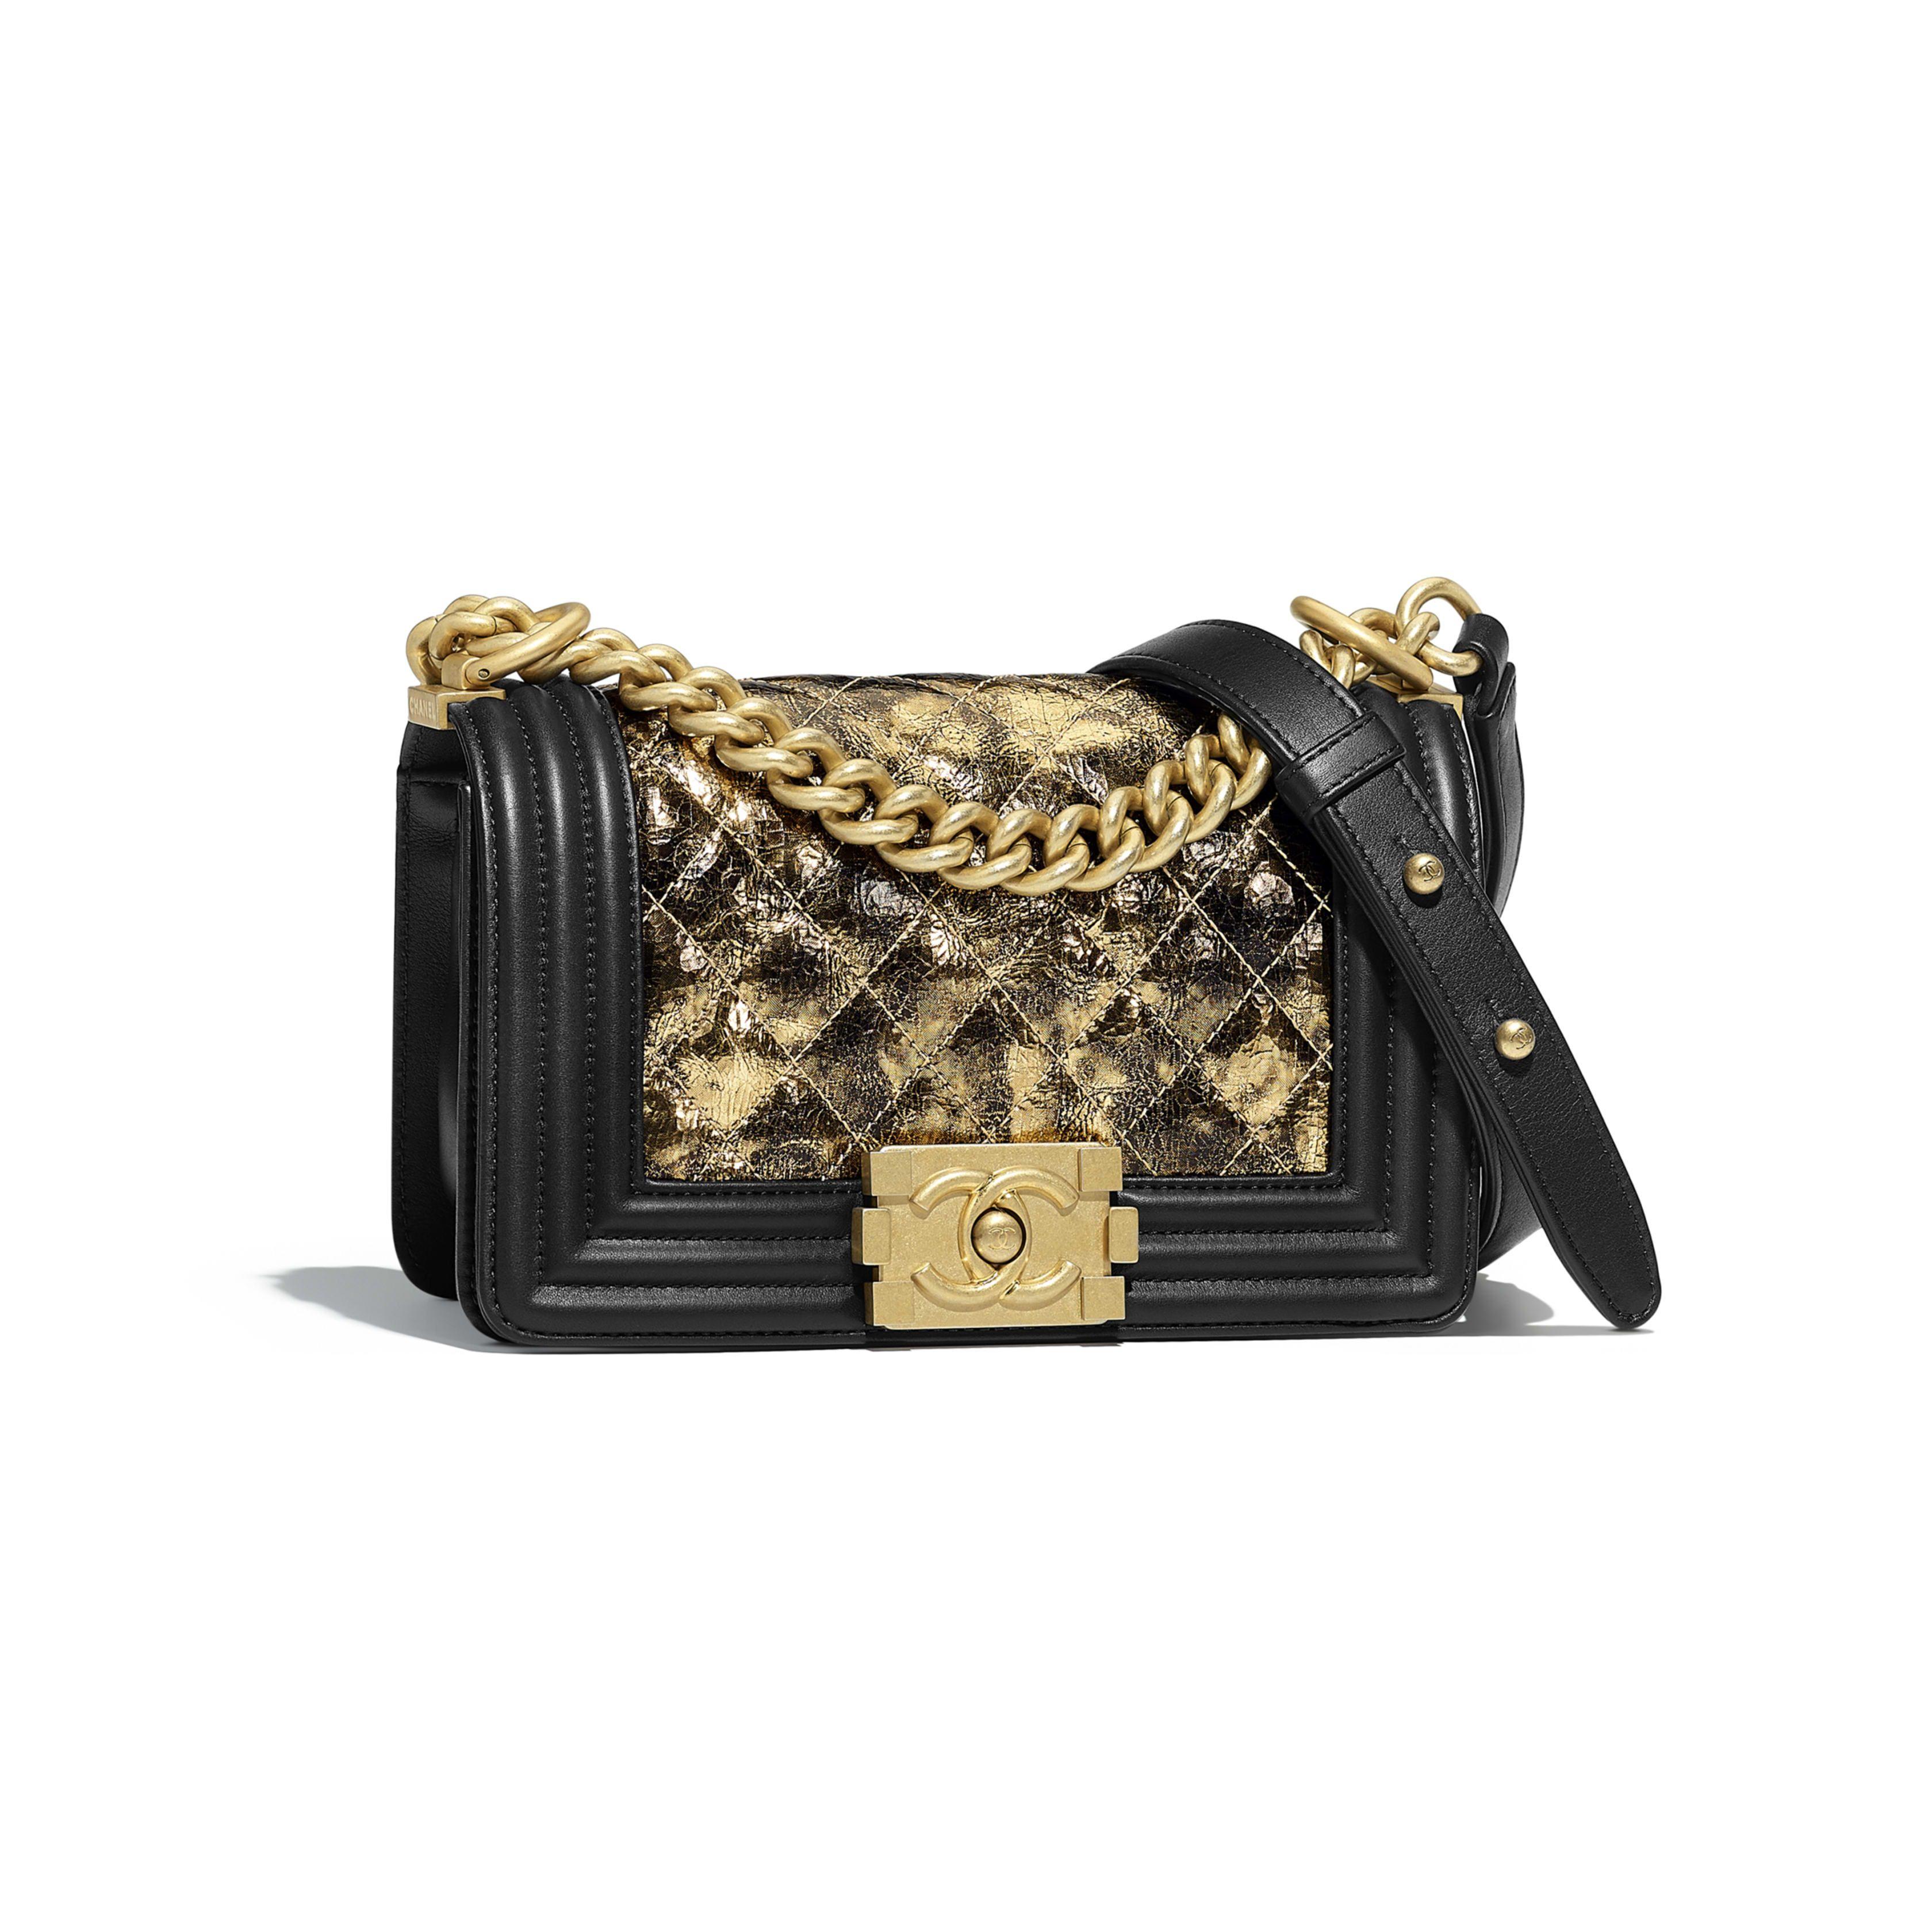 Small Boy Chanel Handbag Metallic Crumpled Goatskin Calfskin Gold Tone Metal Gold Black View 1 Chanel Handbags Small Chanel Handbags Chanel Handbag Boy